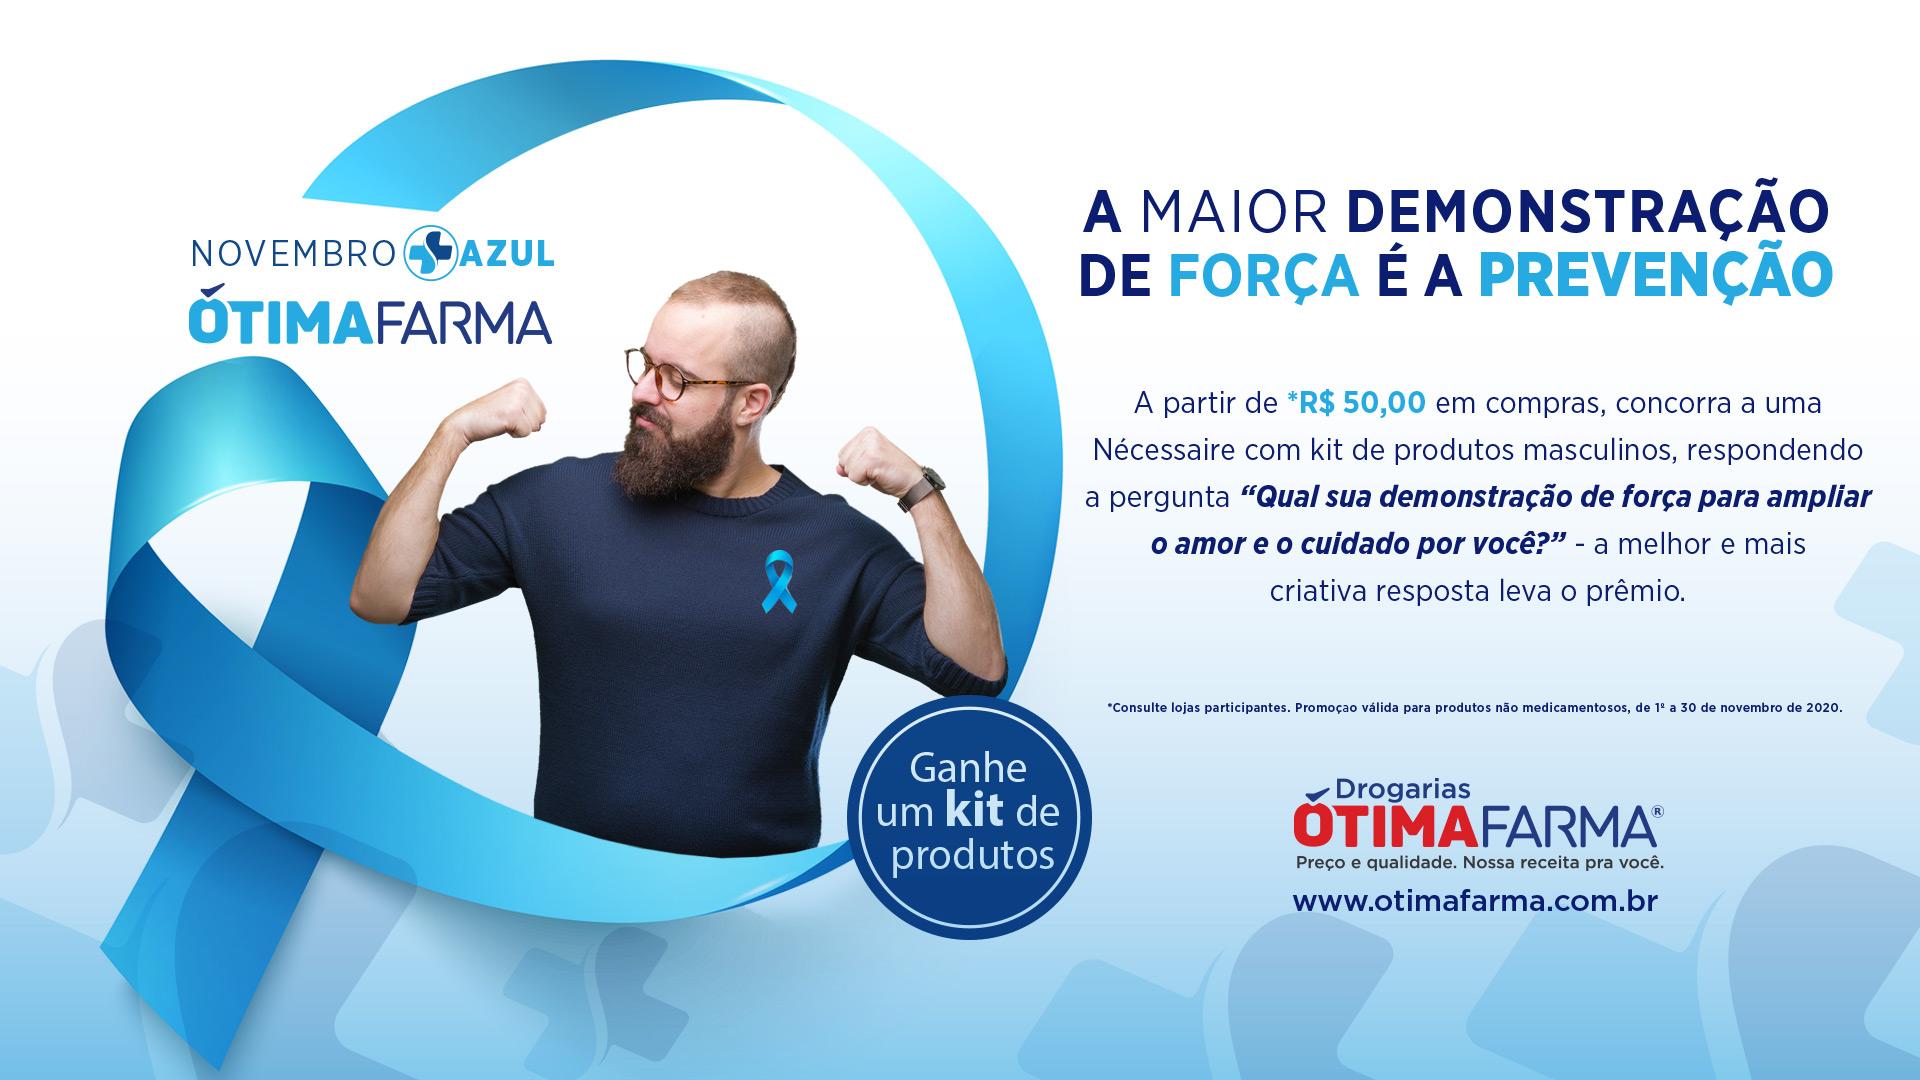 api_modulos/noticia/img/11/1075363010.jpg